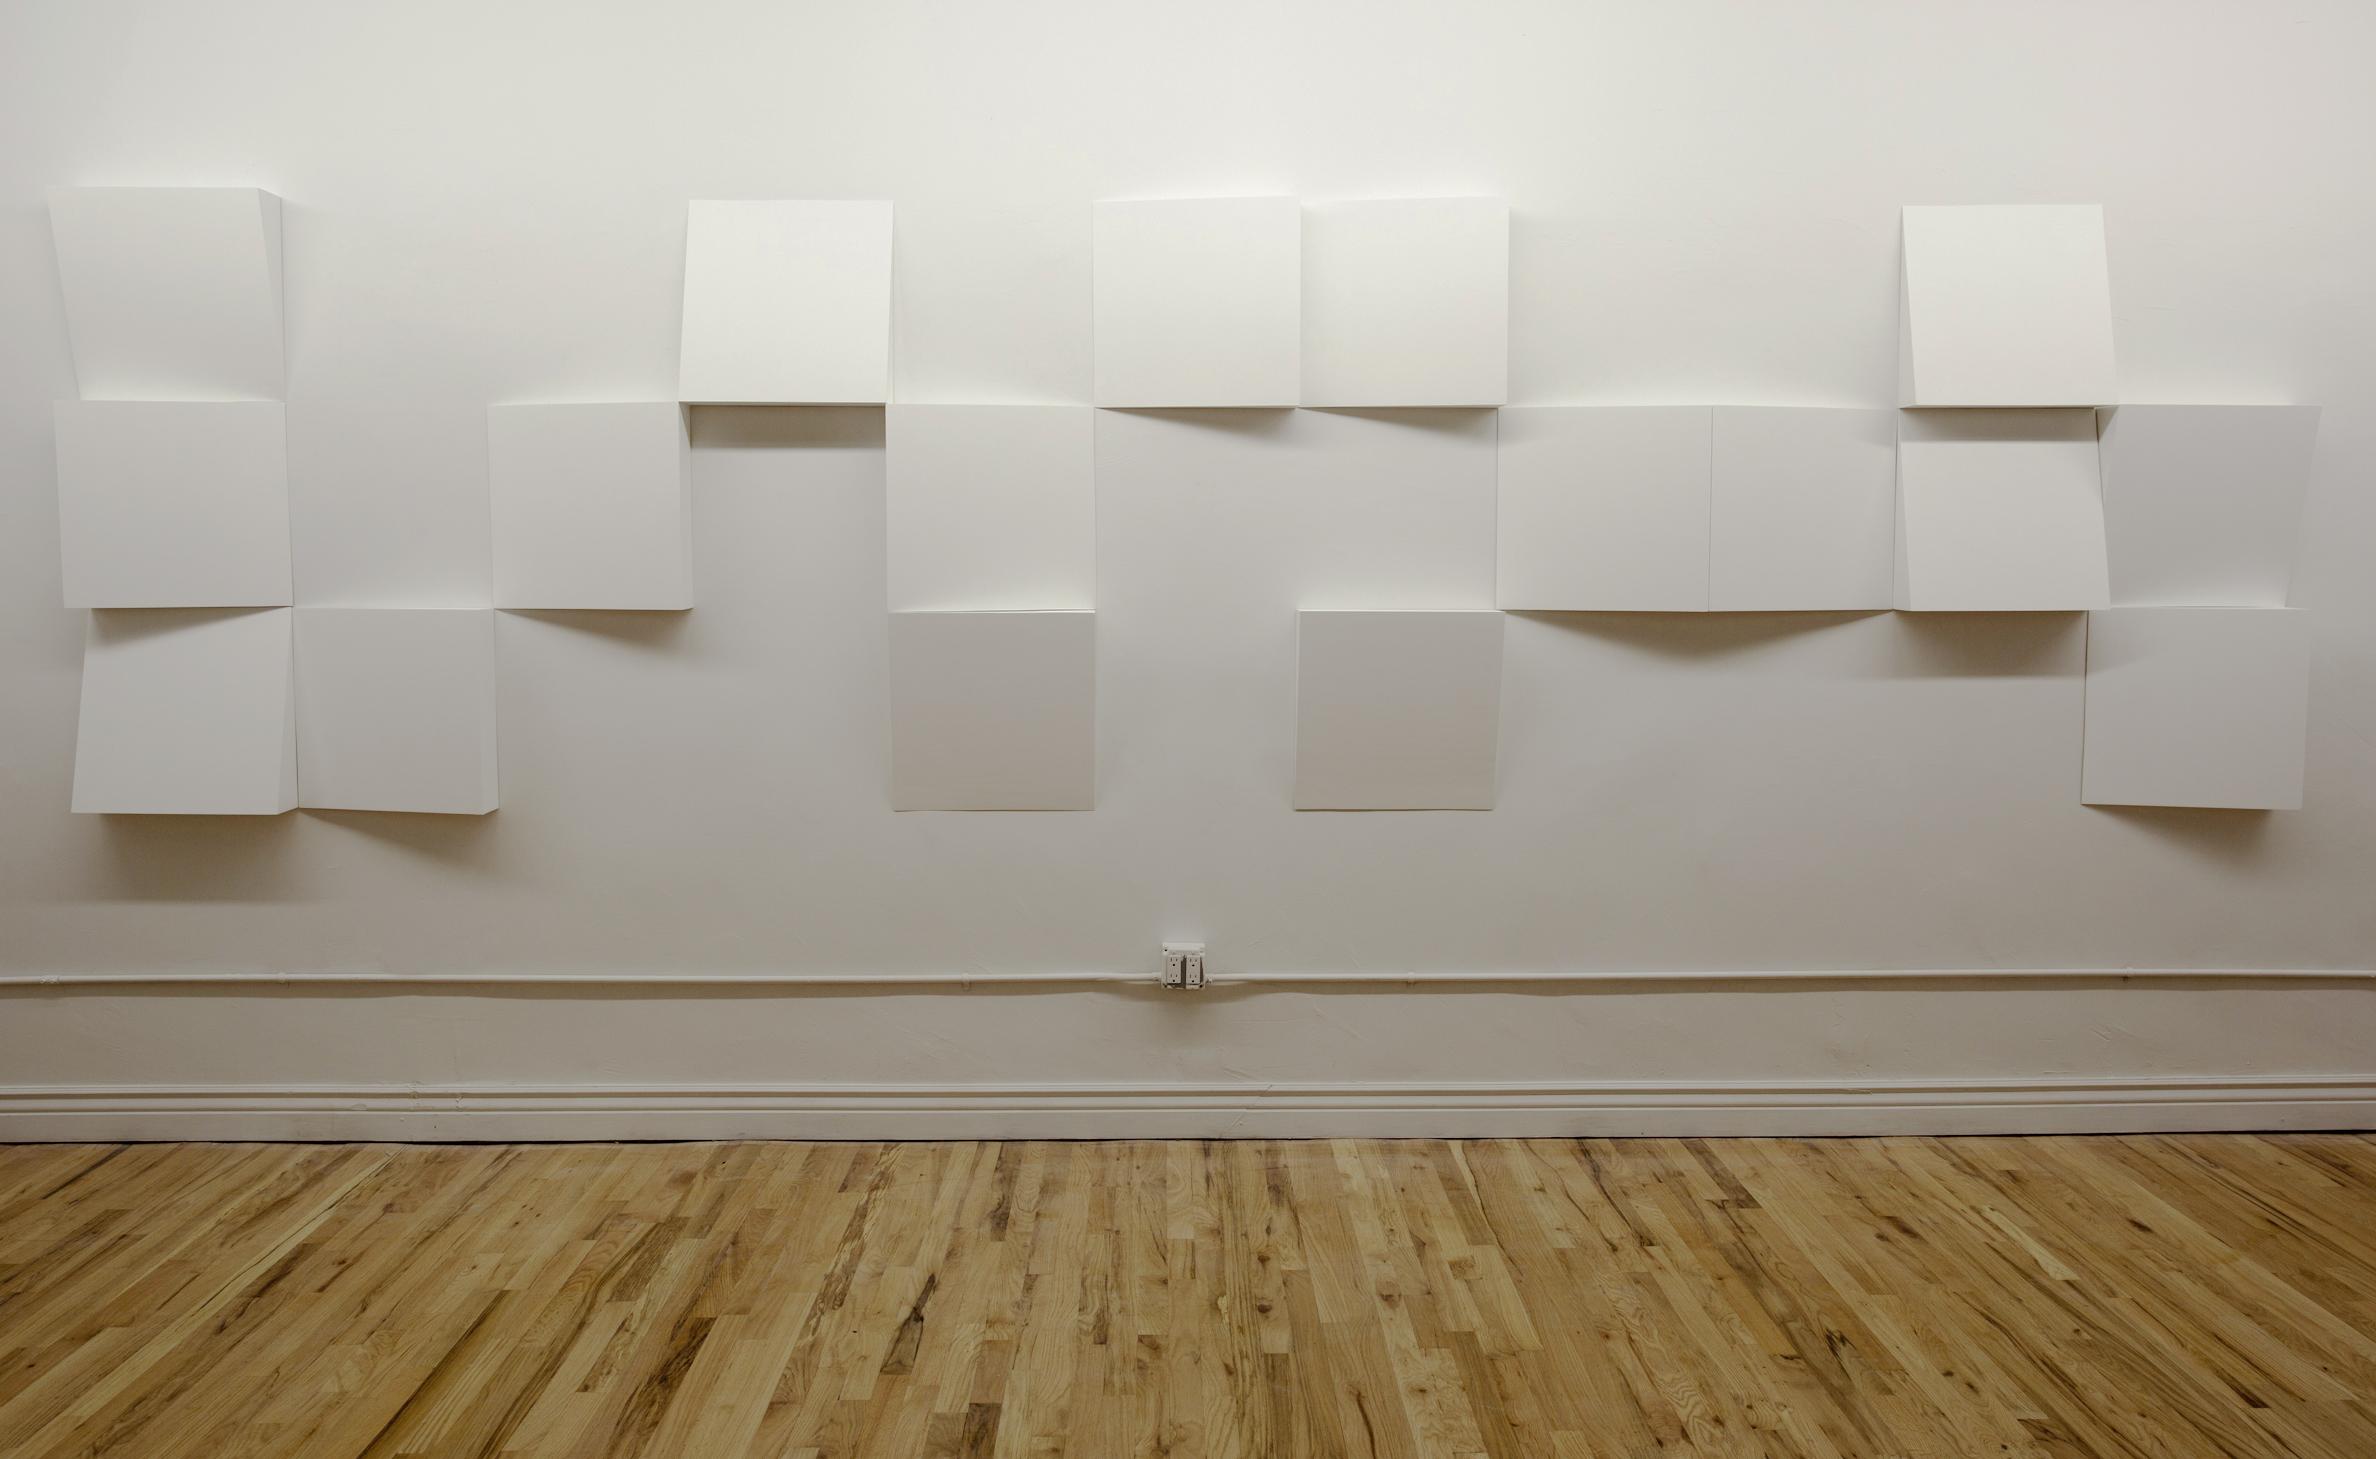 Installation view at Hercules Studios Gallery